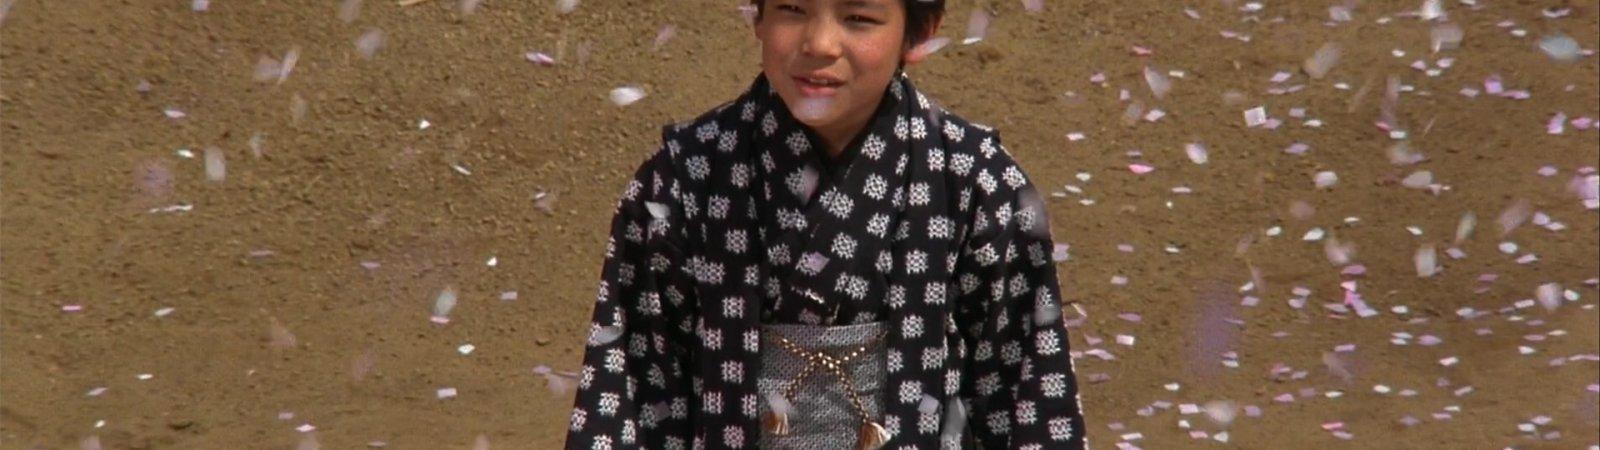 Photo dernier film Toshie Negishi